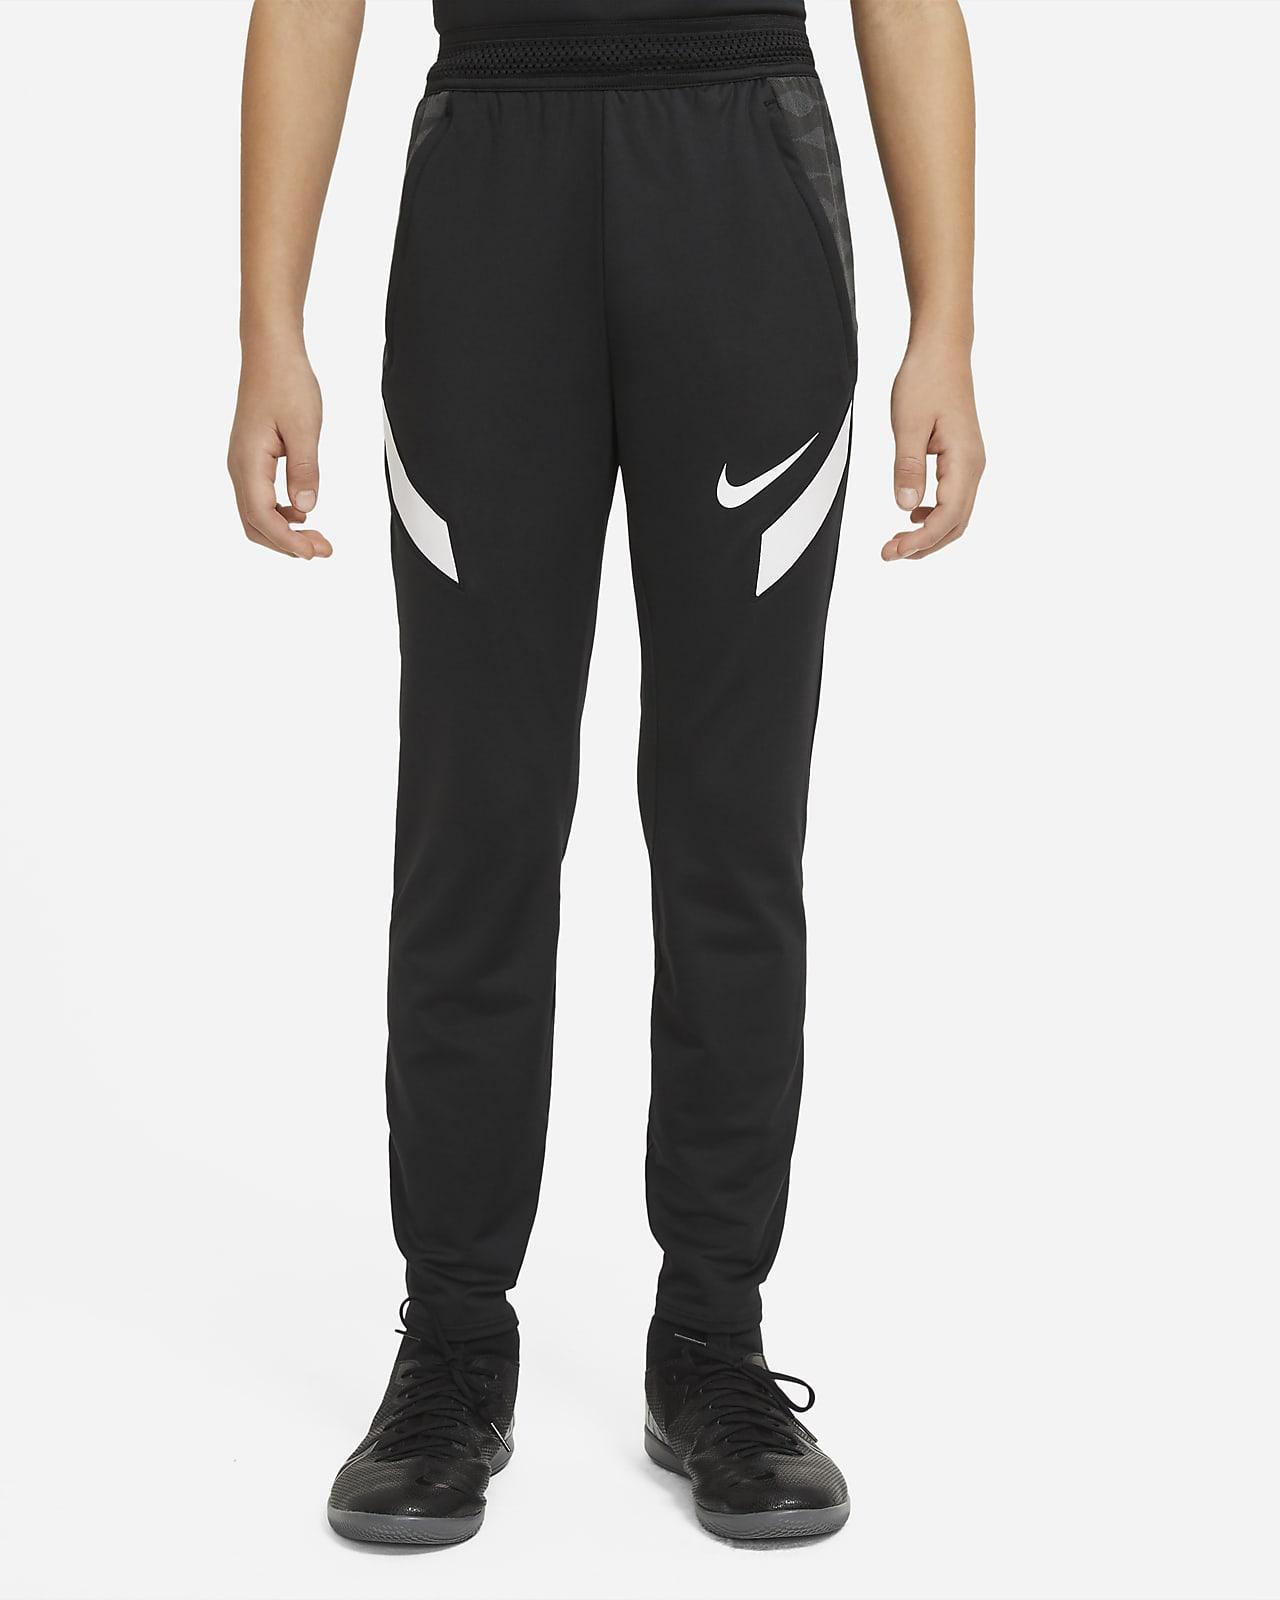 Nike Dri-FIT Strike Older Kids' Knit Football Pants